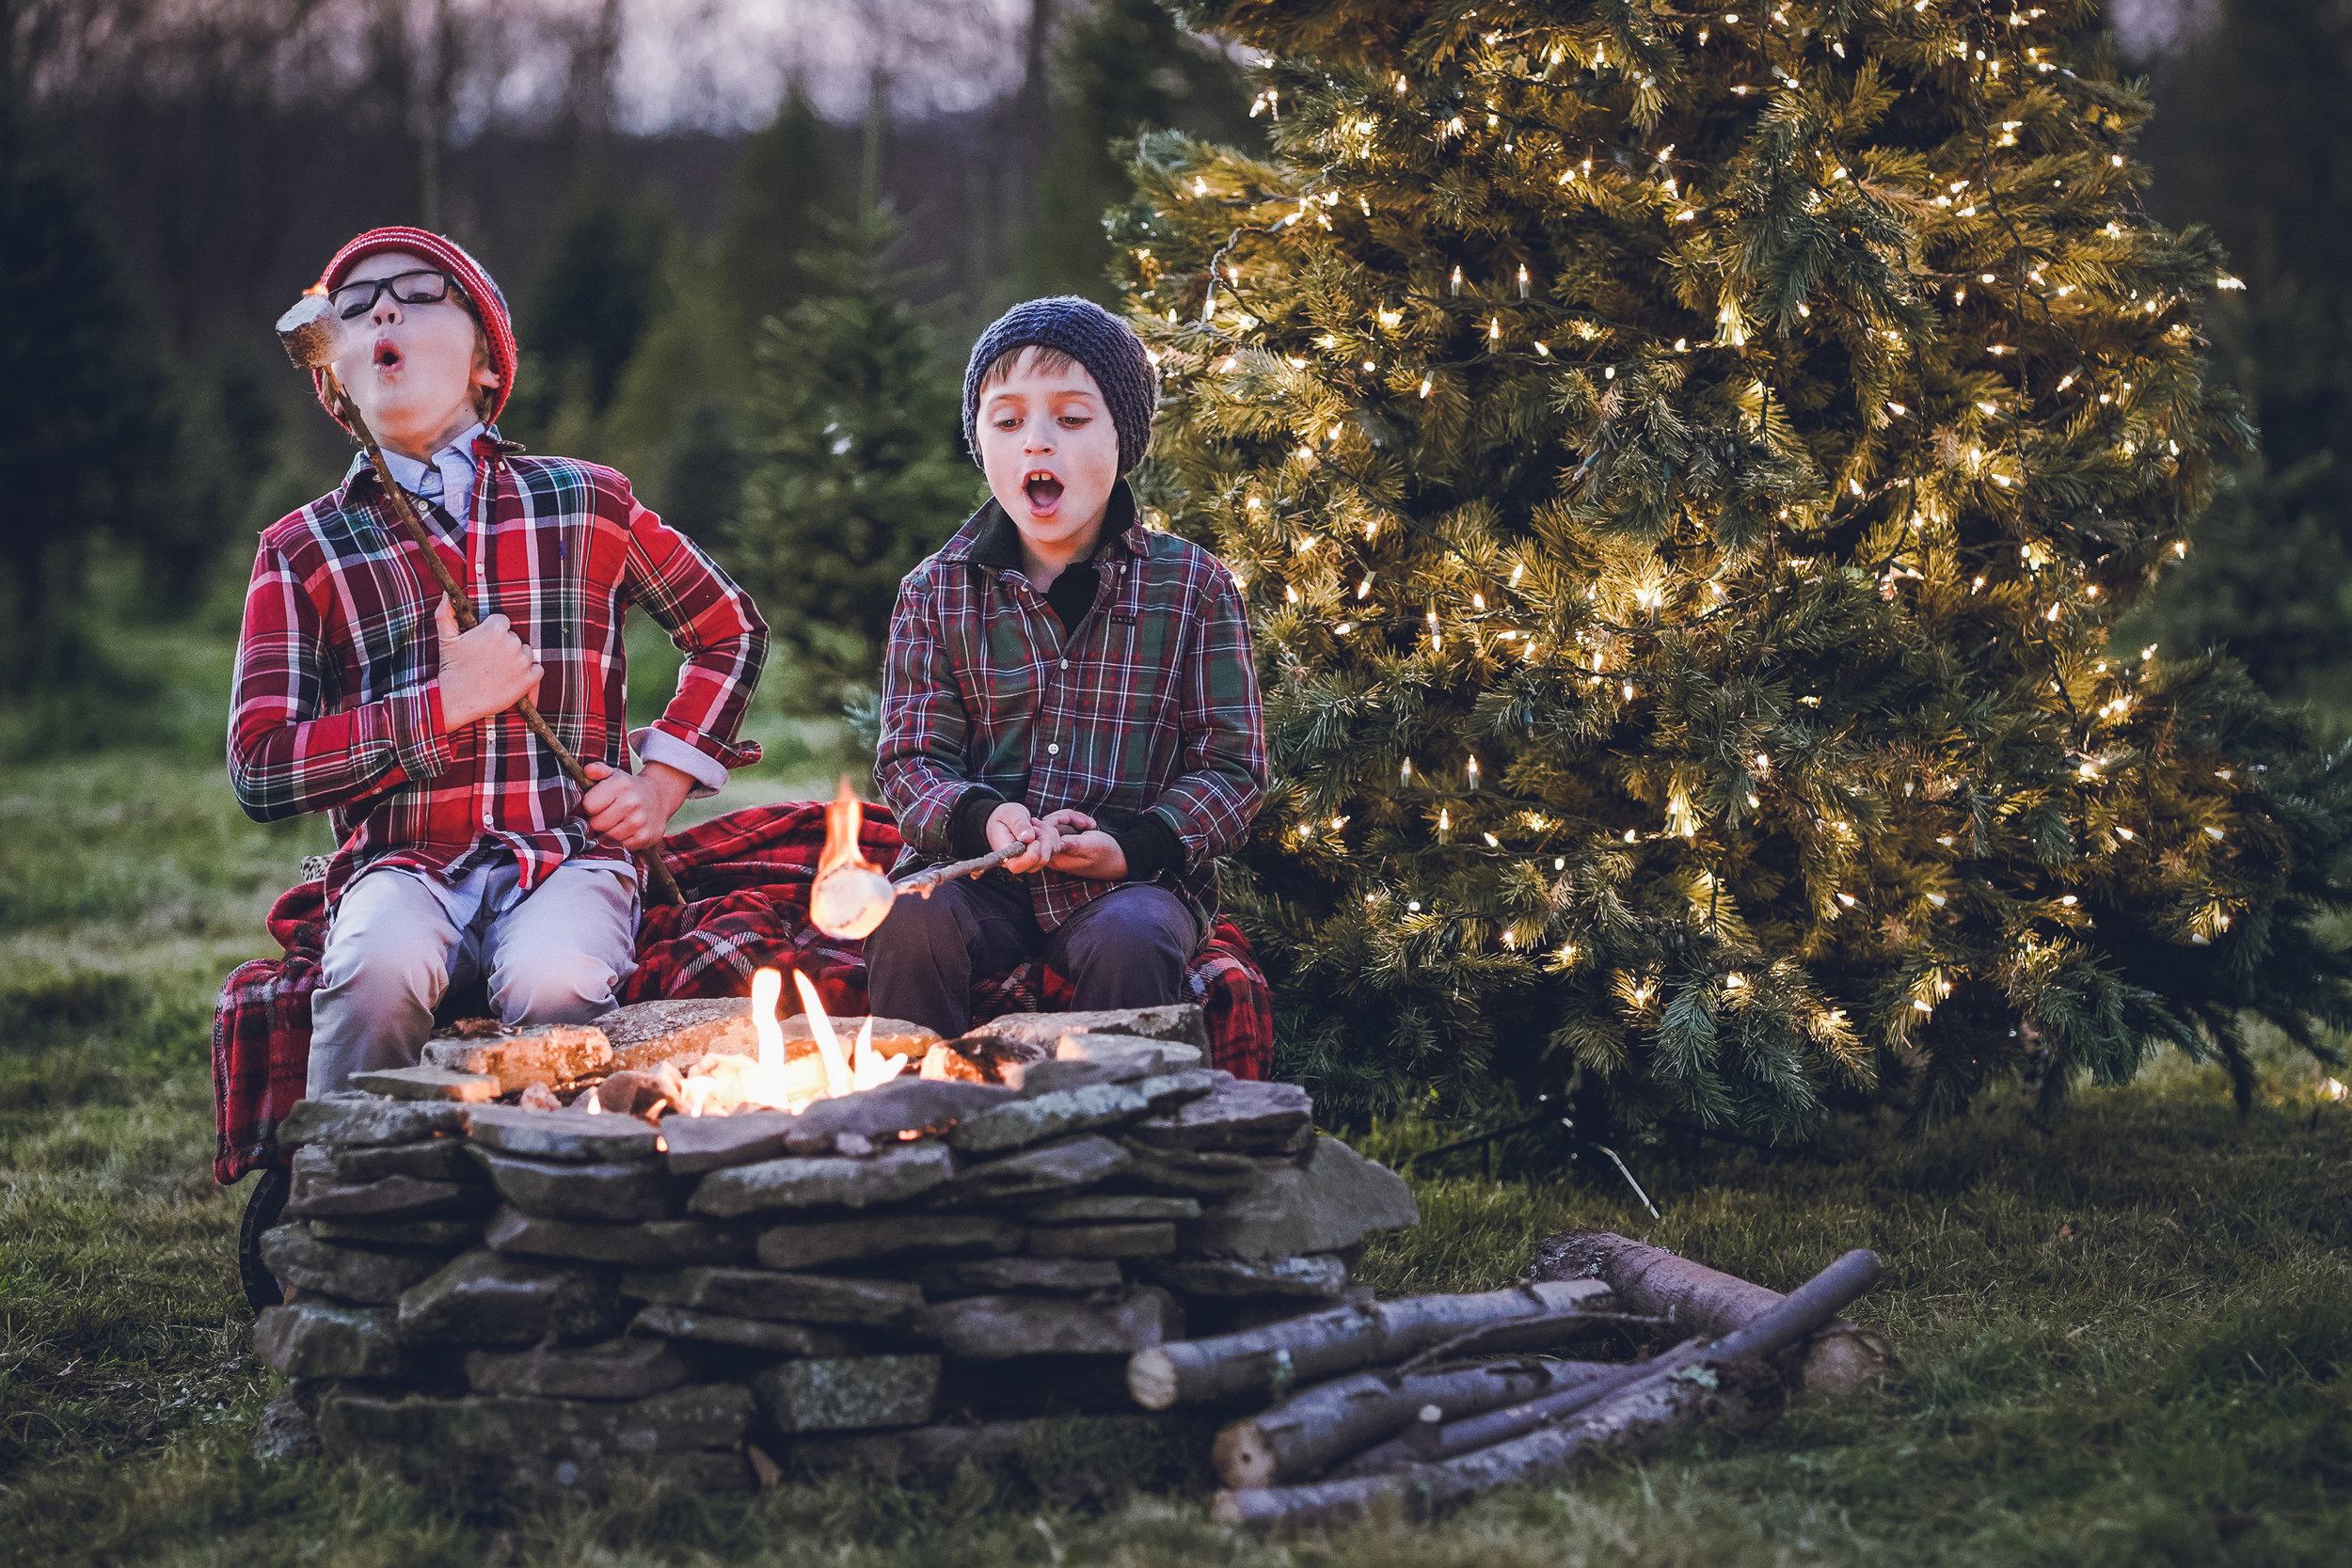 Clarks-Summit-Scranton-Photographers-christmas-holidays-card-3.jpg